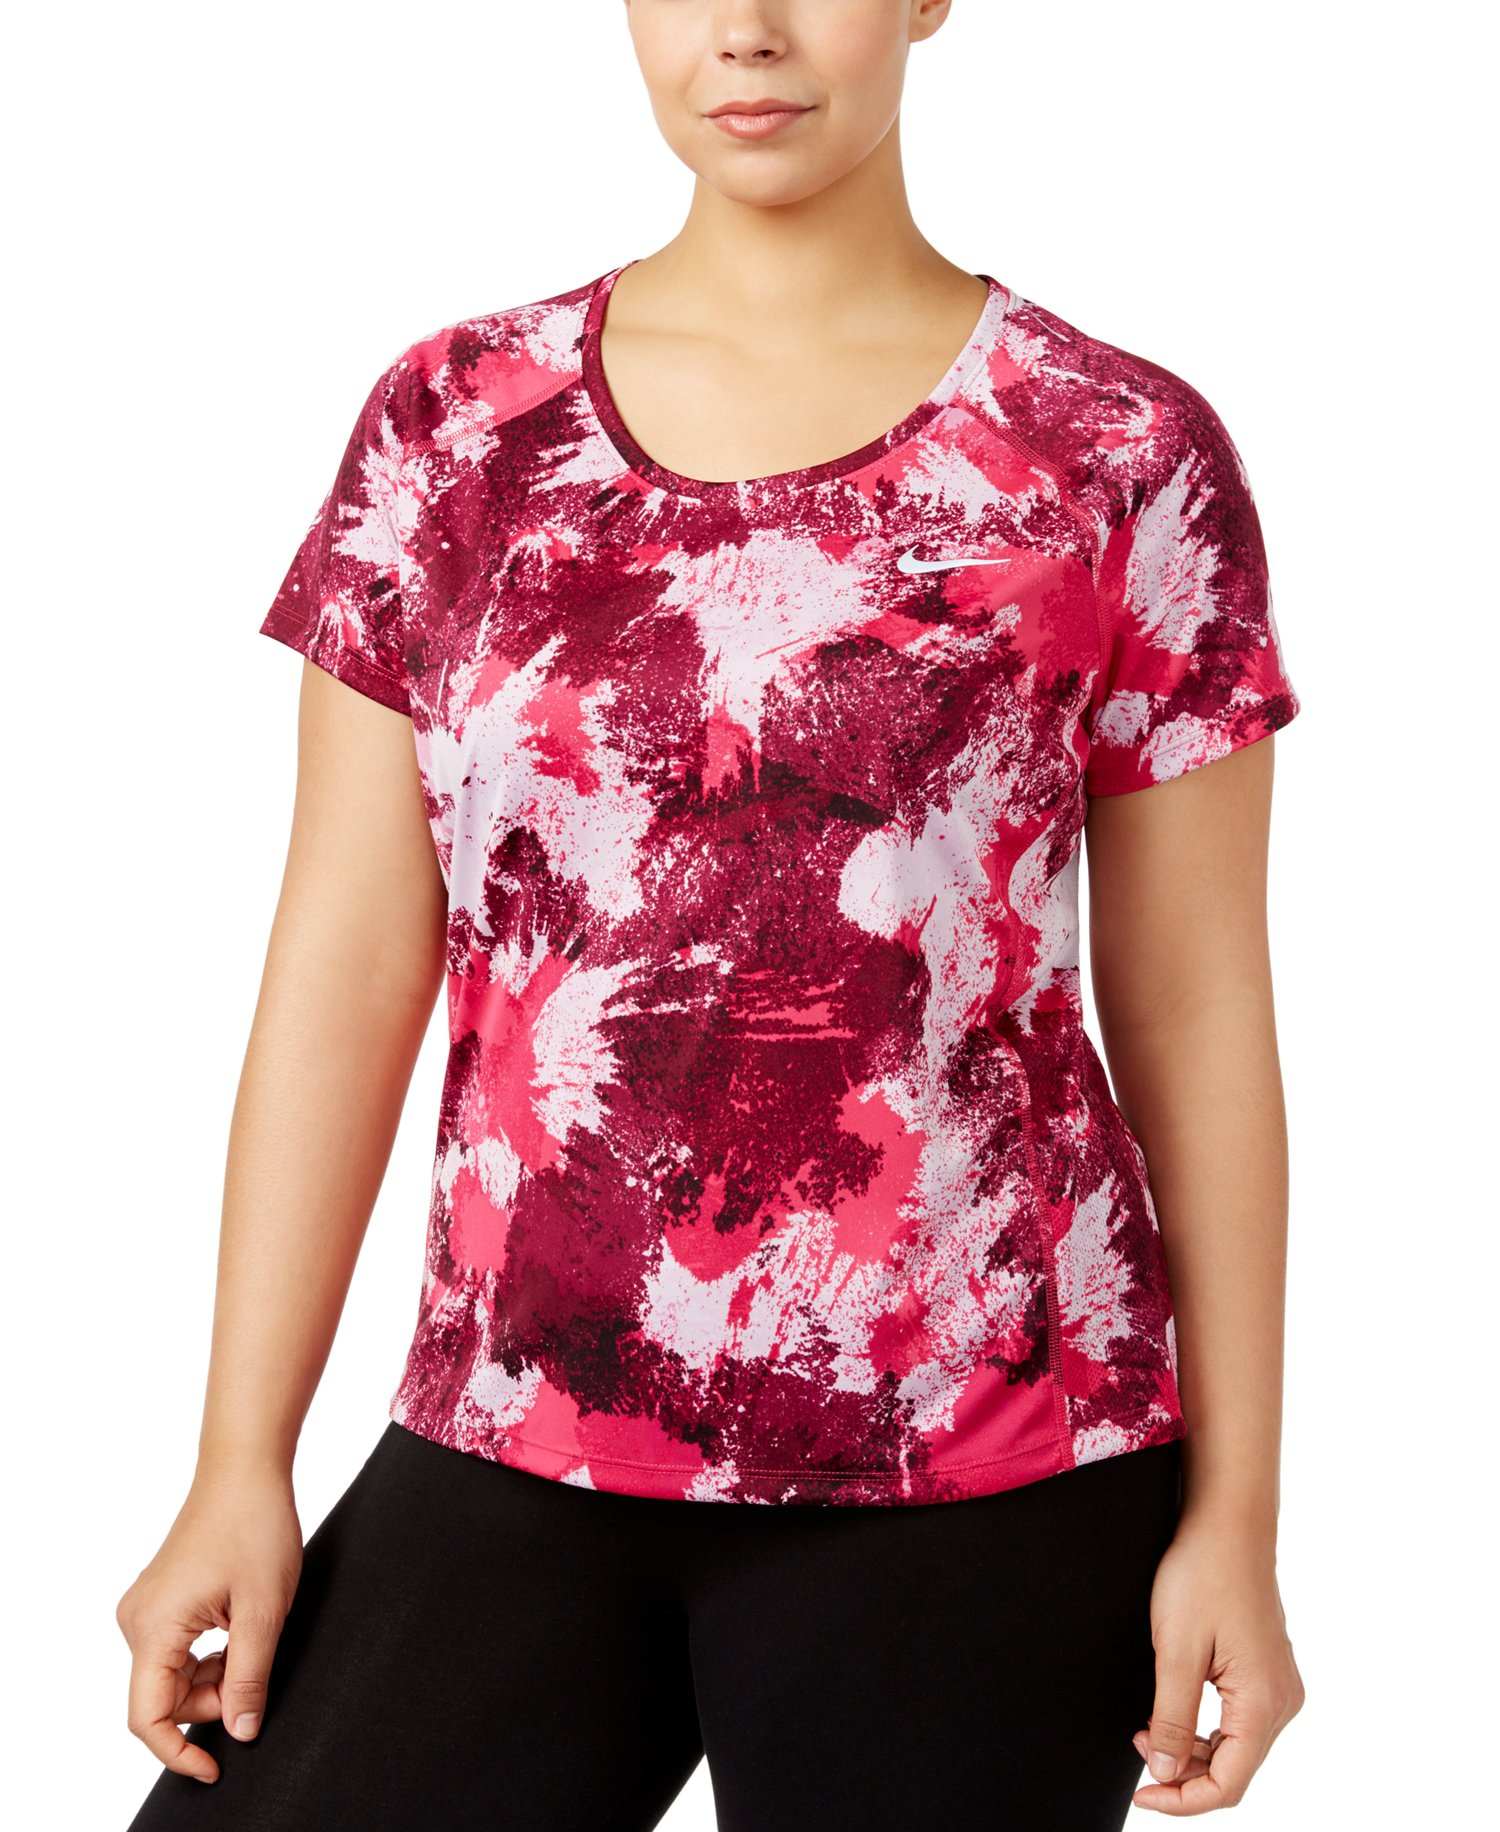 NIKE Women's Plus Size Dry Miller Running Shirt (True Berry, 2X)